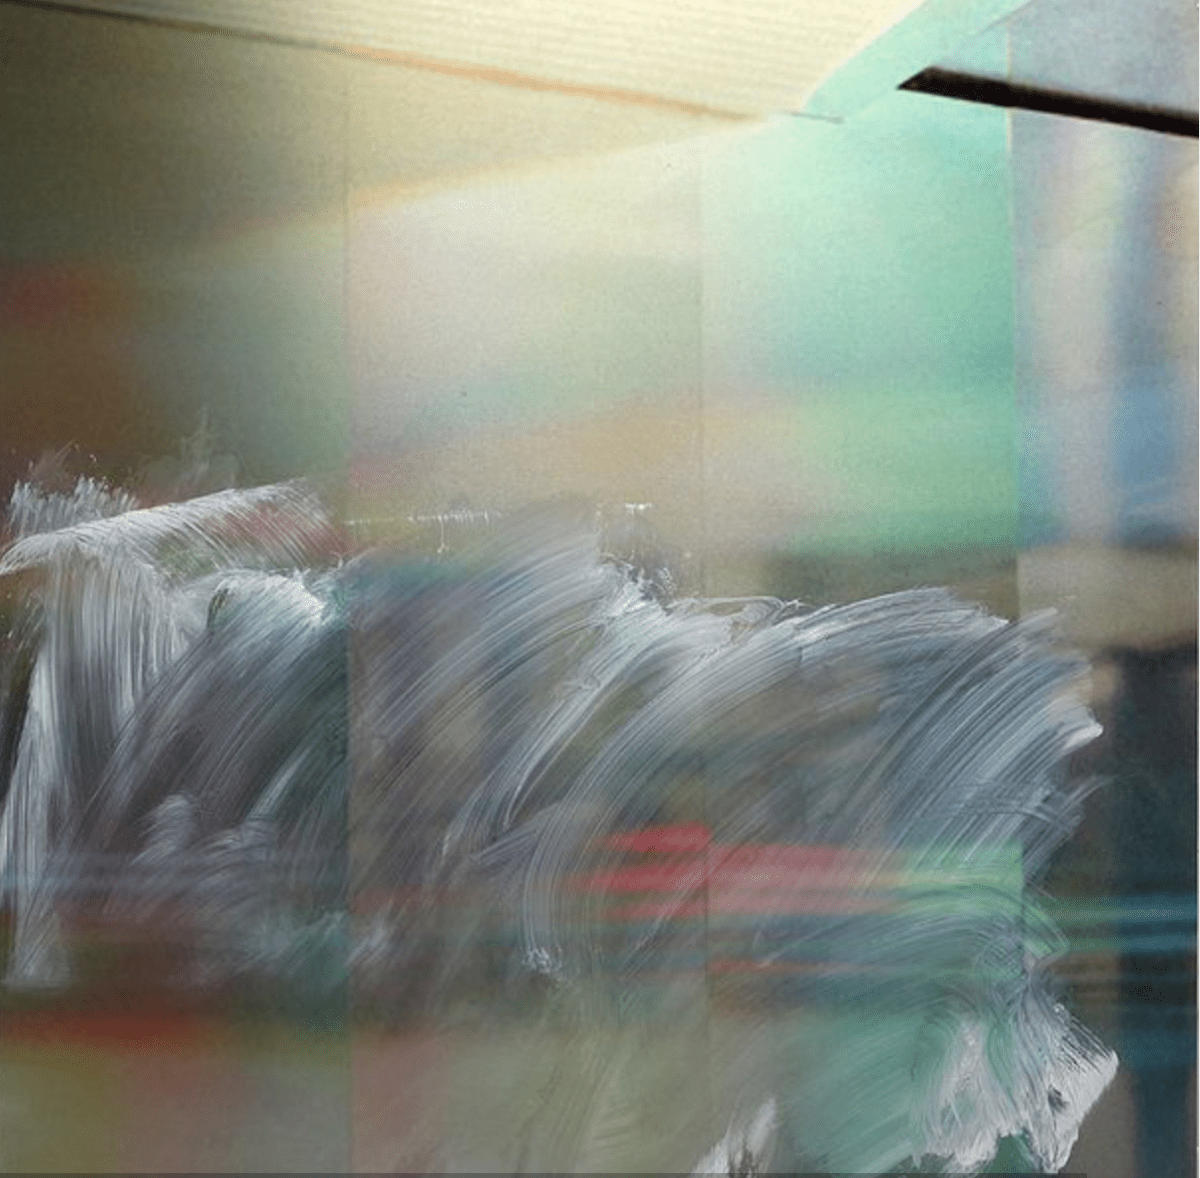 "Justine Frischmann, Lambent #74, oil, acrylic spray enamel over sublimation print on aluminum, 30"" x 30,"" 2015."